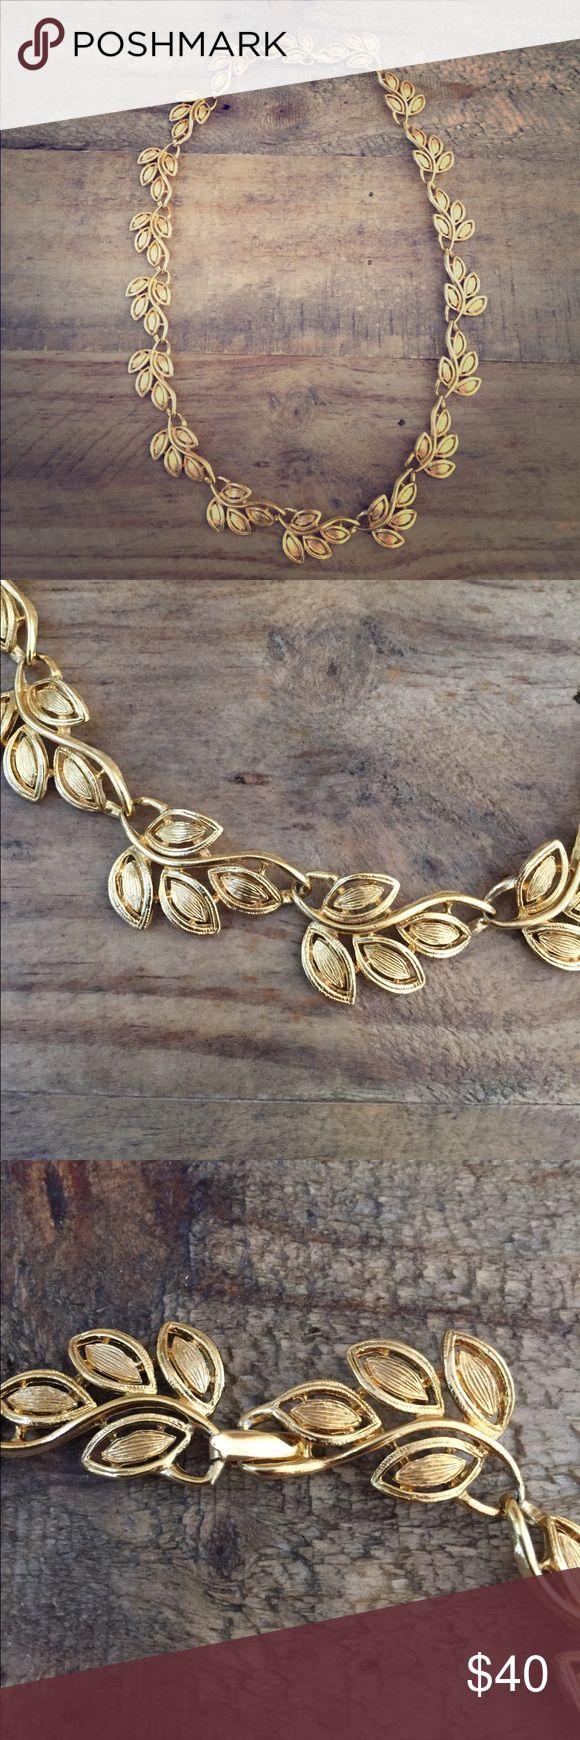 Vintage Napier Leaf Choker Statement Necklace Gently Preloved Napier Jewelry Necklaces